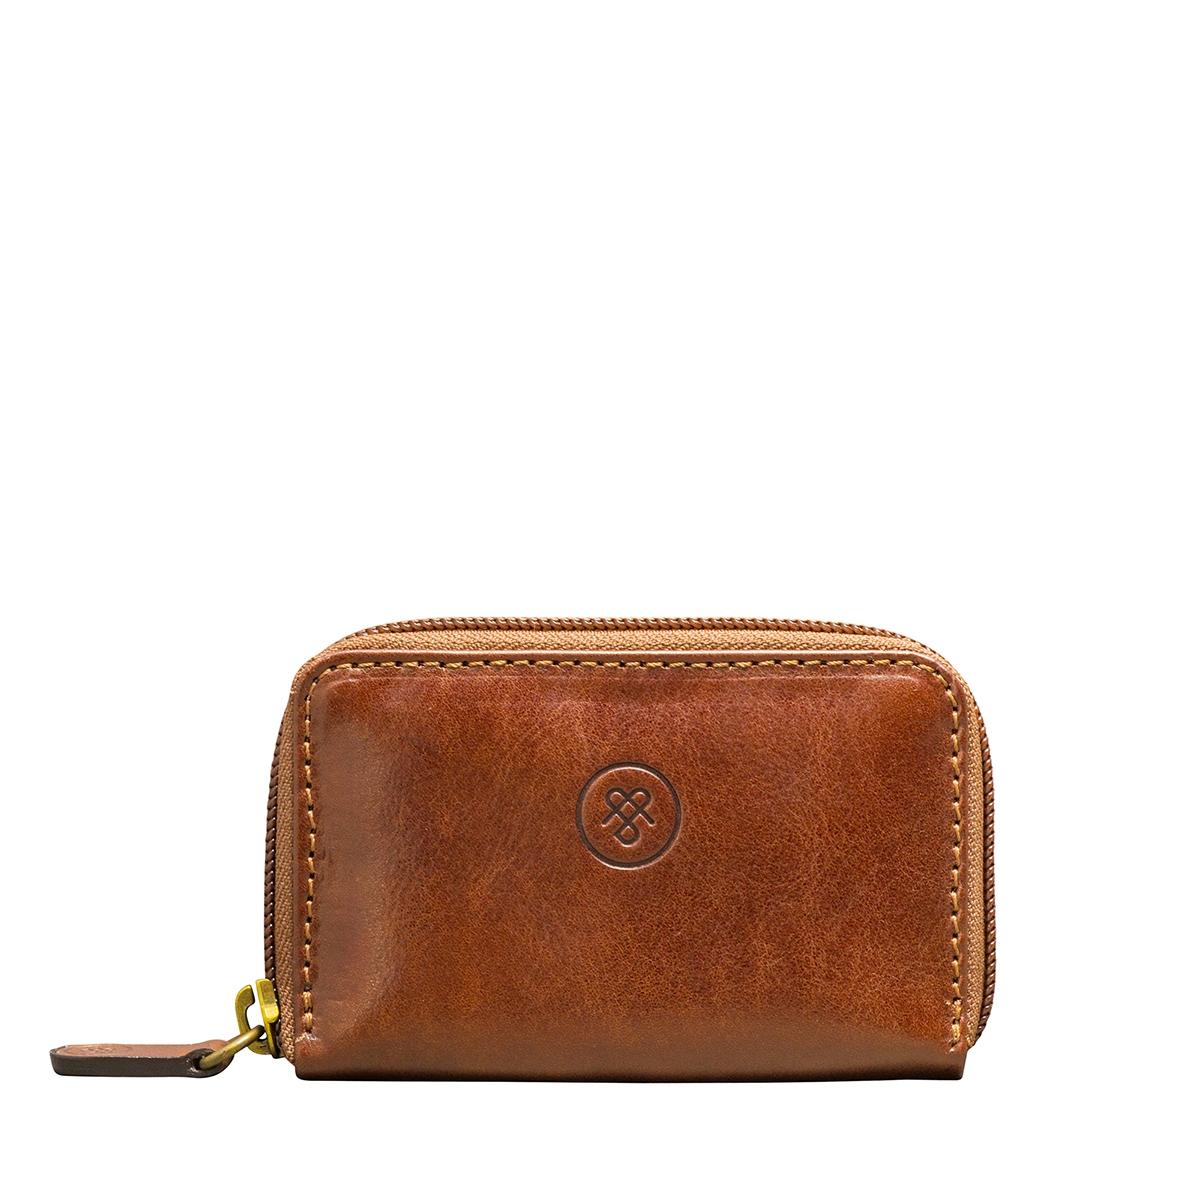 MAXWELL SCOTT BAGS Luxury Tan Real Leather Key Wallet